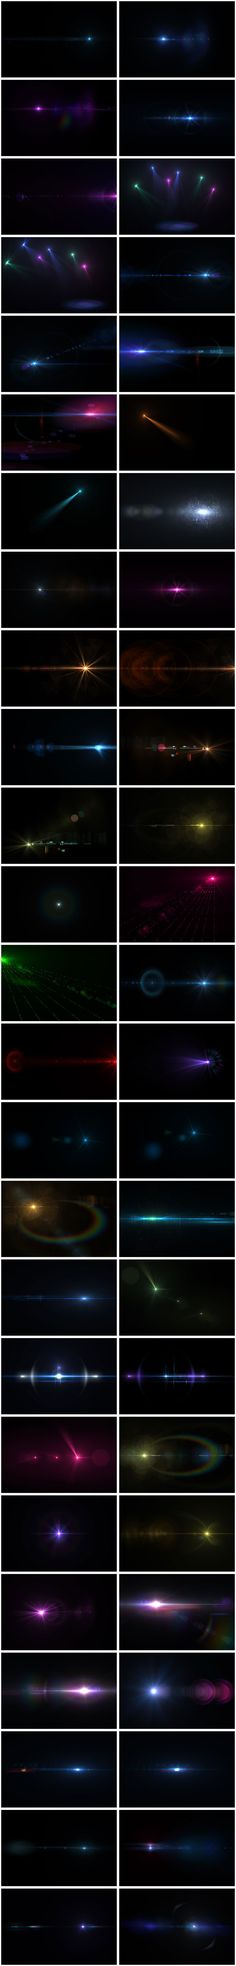 Custom Lens Flares Pack – 50 Free High Resolution Transparent Images | Media Militia